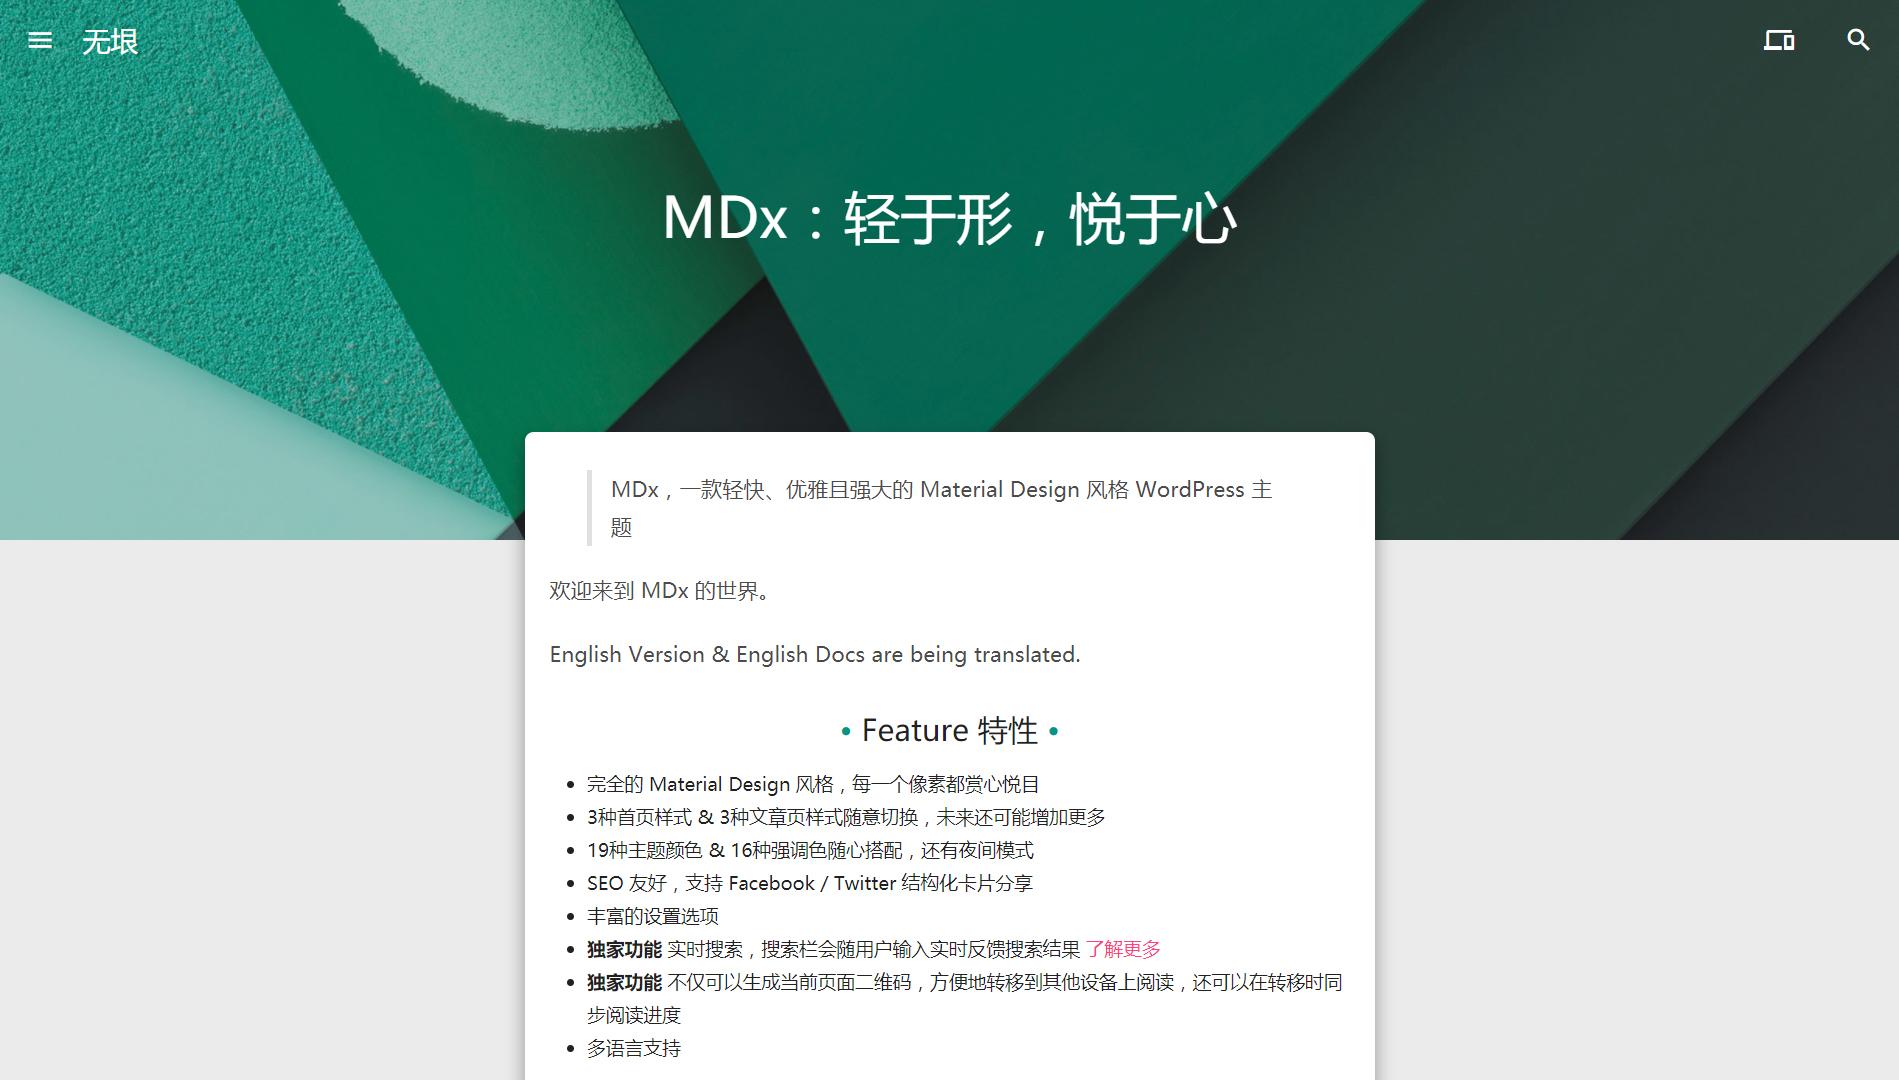 WordPress单栏博客主题MDx分享 前言